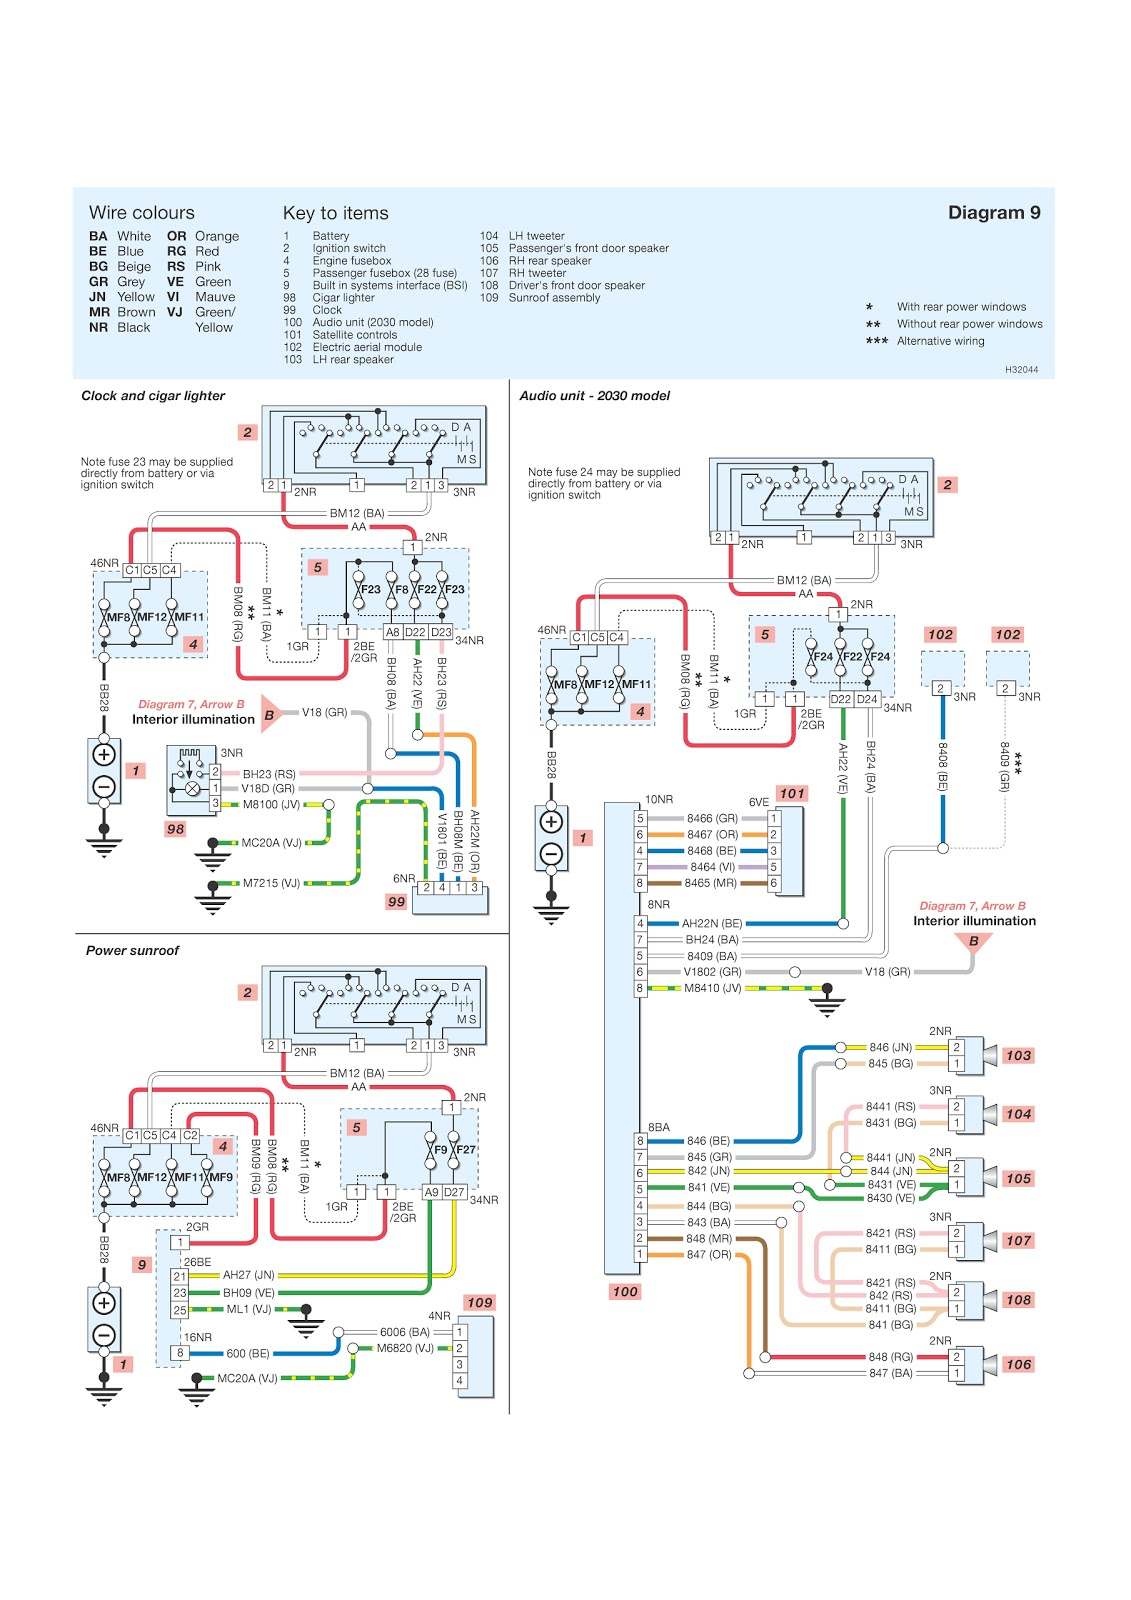 peugeot 206 system wiring diagrams clock cigar lighter [ 1131 x 1600 Pixel ]